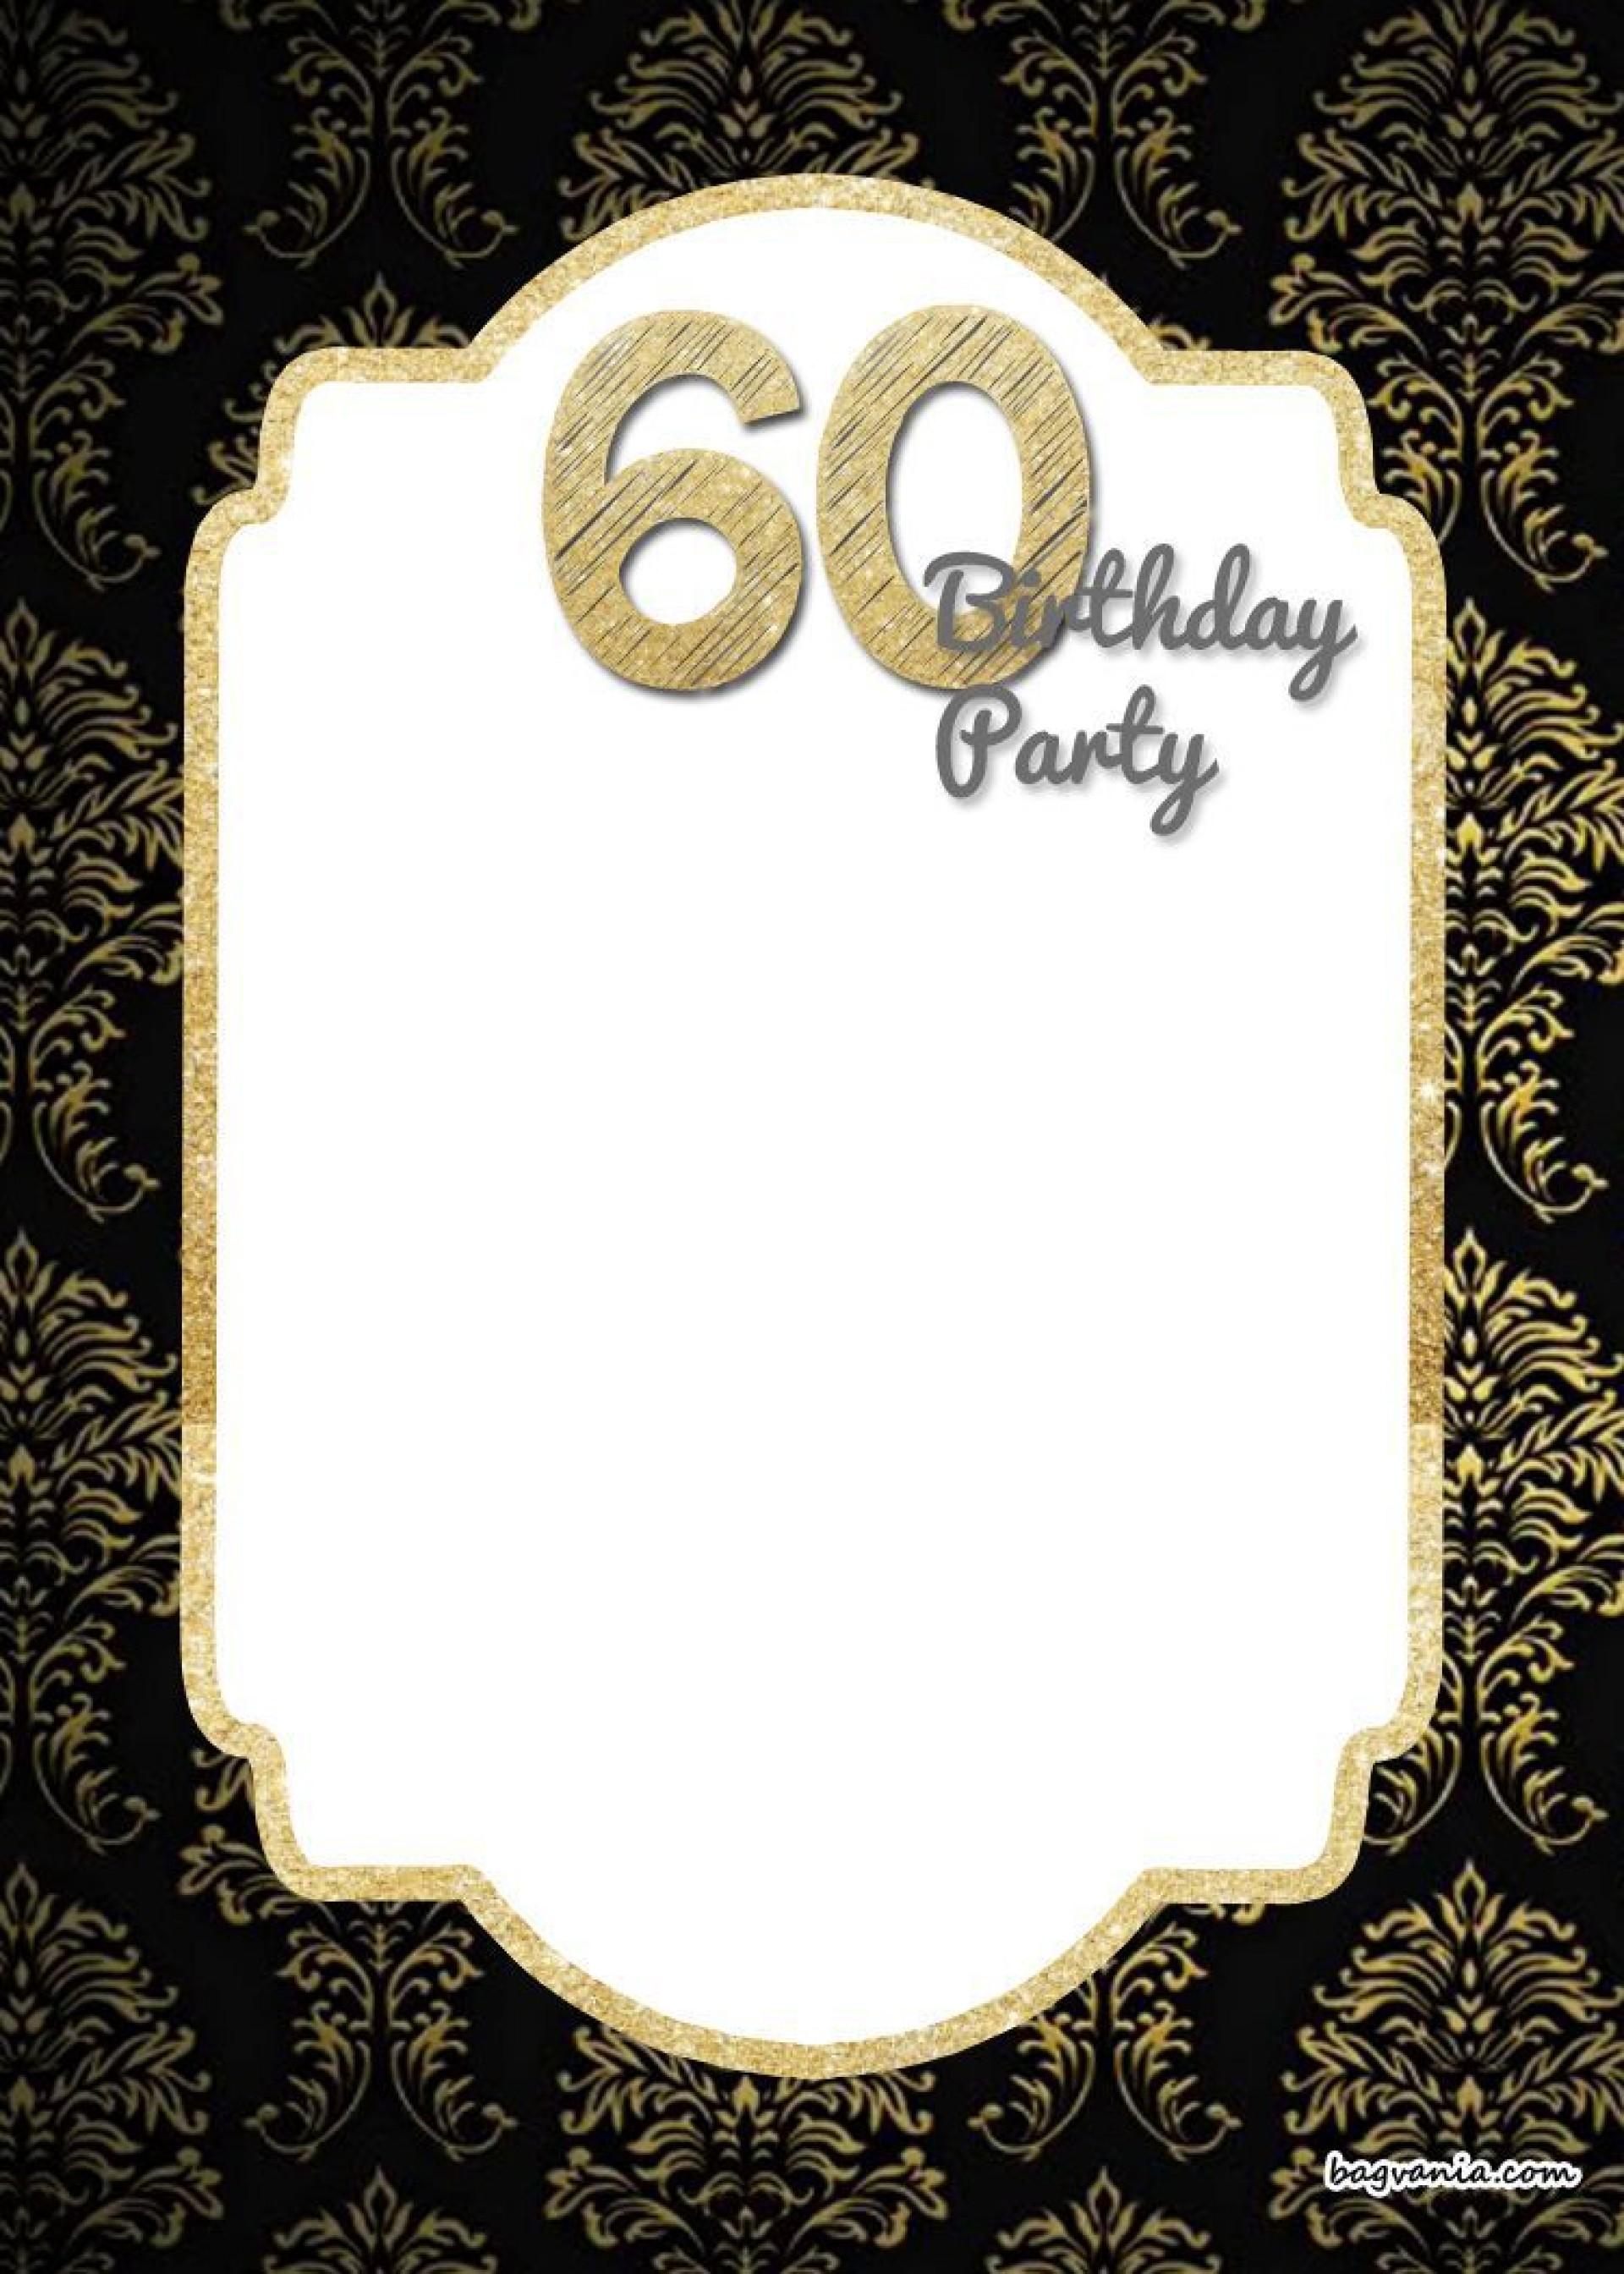 005 Marvelou 70th Birthday Invitation Template Free Picture  Surprise Invite With Photo1920